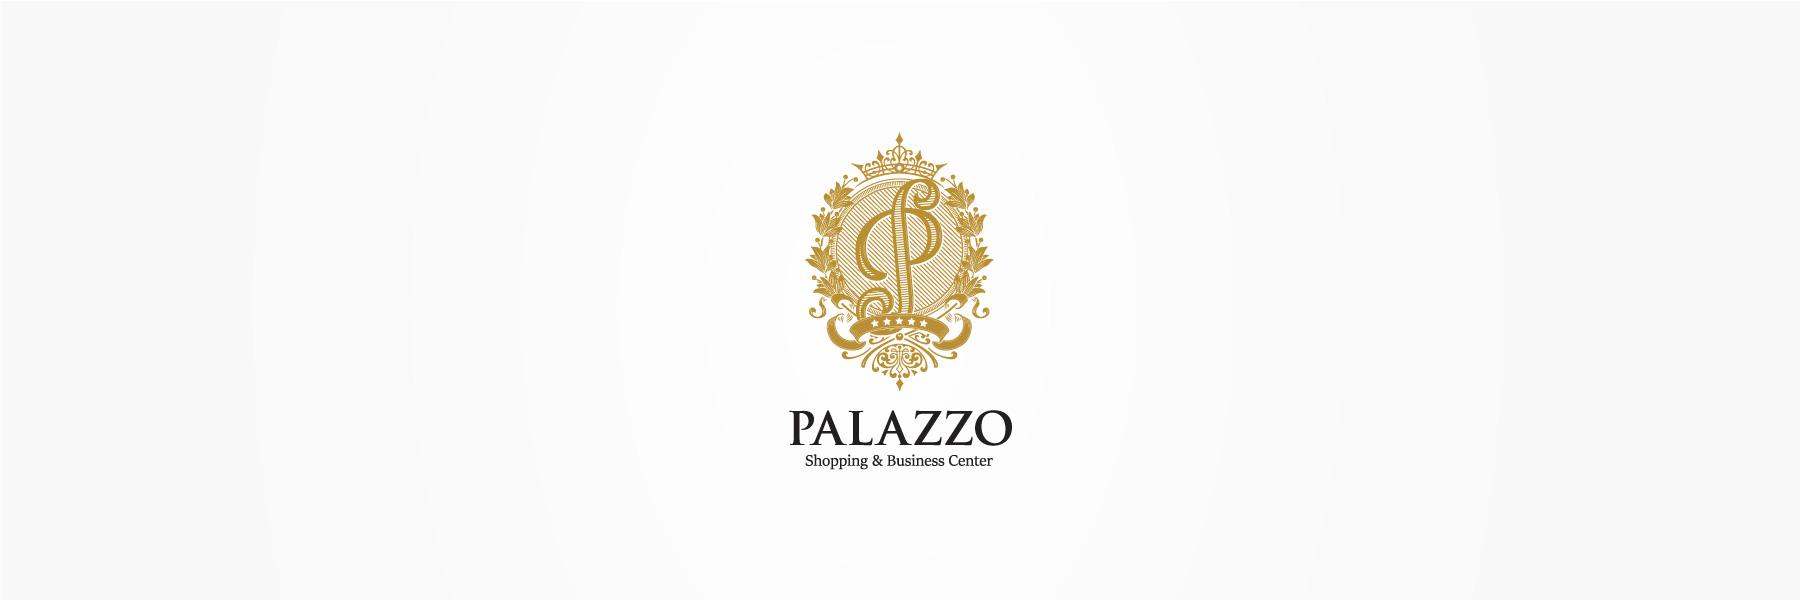 palazzo-logo-design